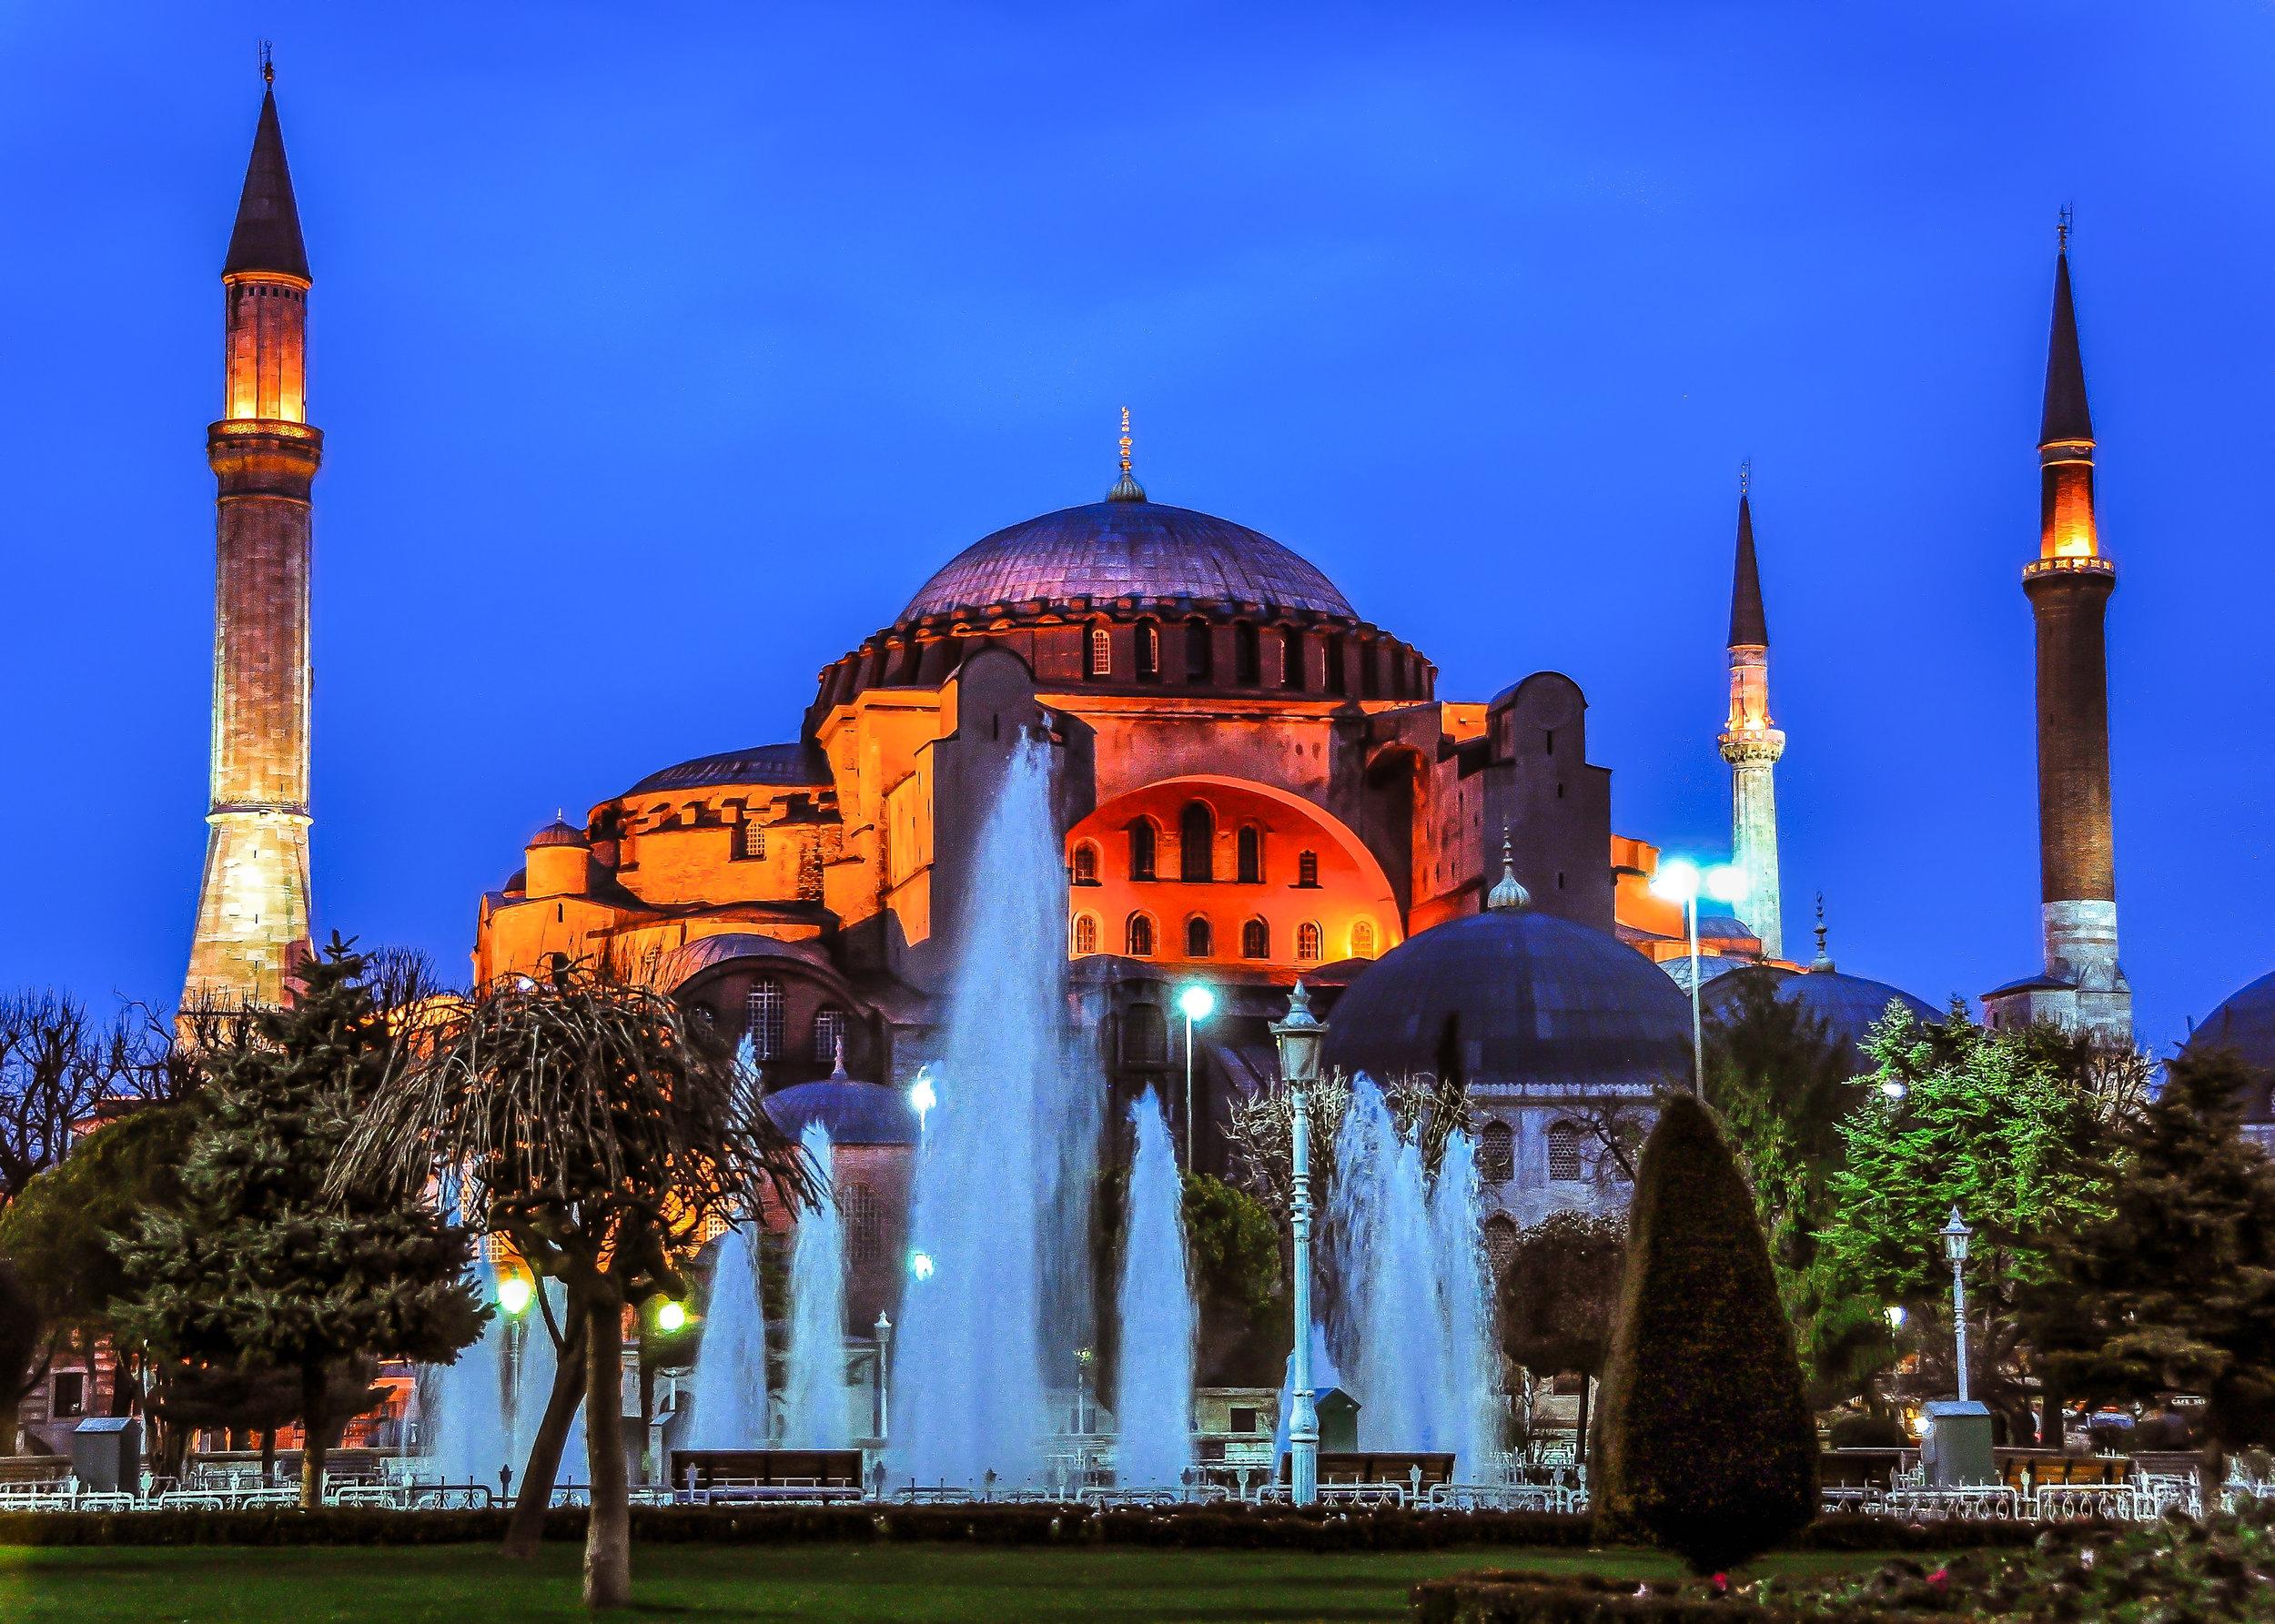 Byzantine Beauty - Hagia Sophia (Istanbul, Turkey)